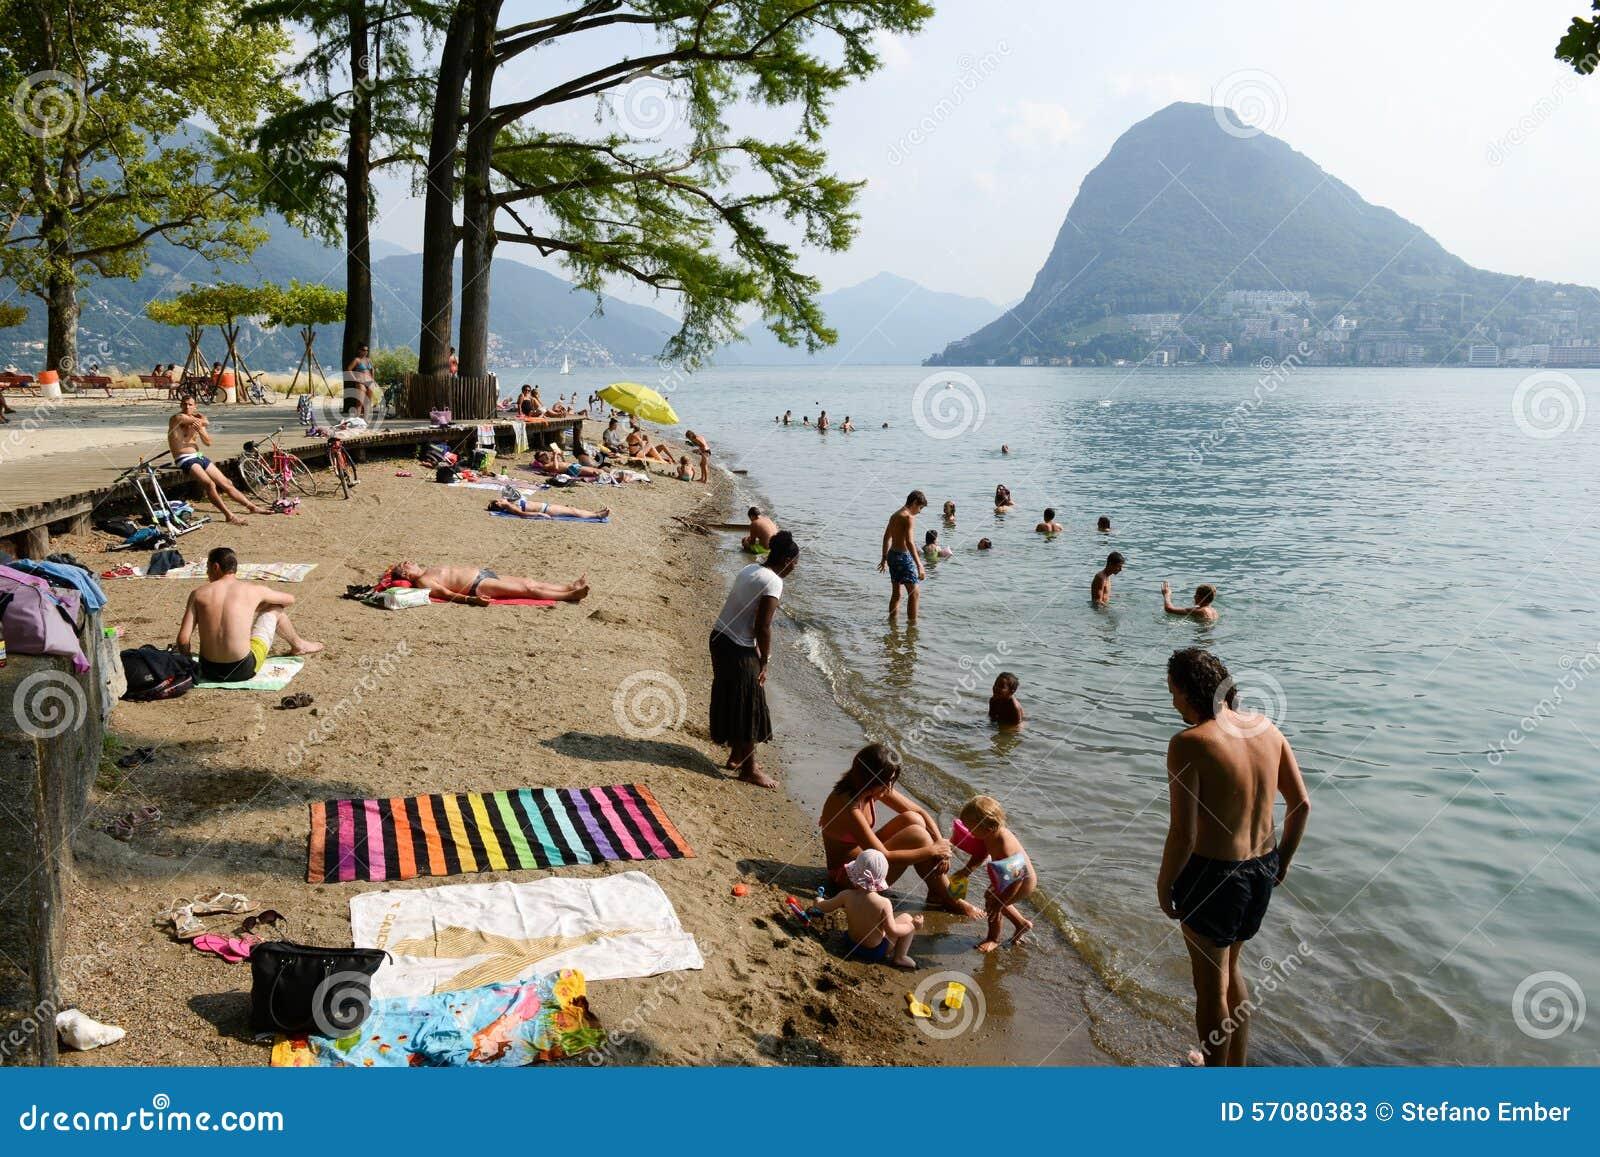 the beach of ciani botanical park at lugano on switzerland Fish Clip Art Sunscreen Clip Art